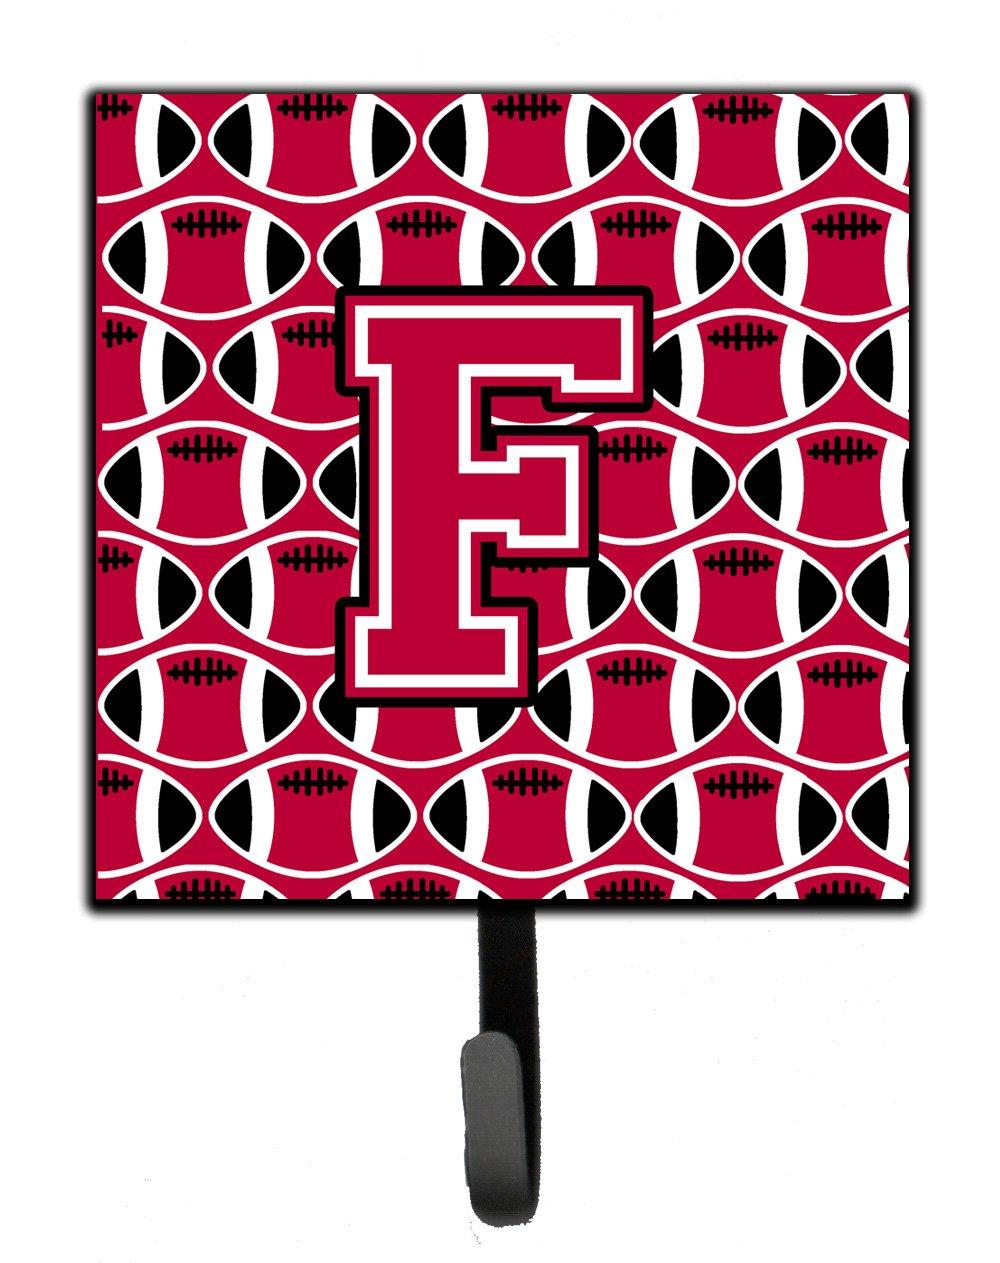 Carolines Treasures Letter F Football Crimson and White Leash or Key Holder CJ1079-FSH4 Small Multicolor